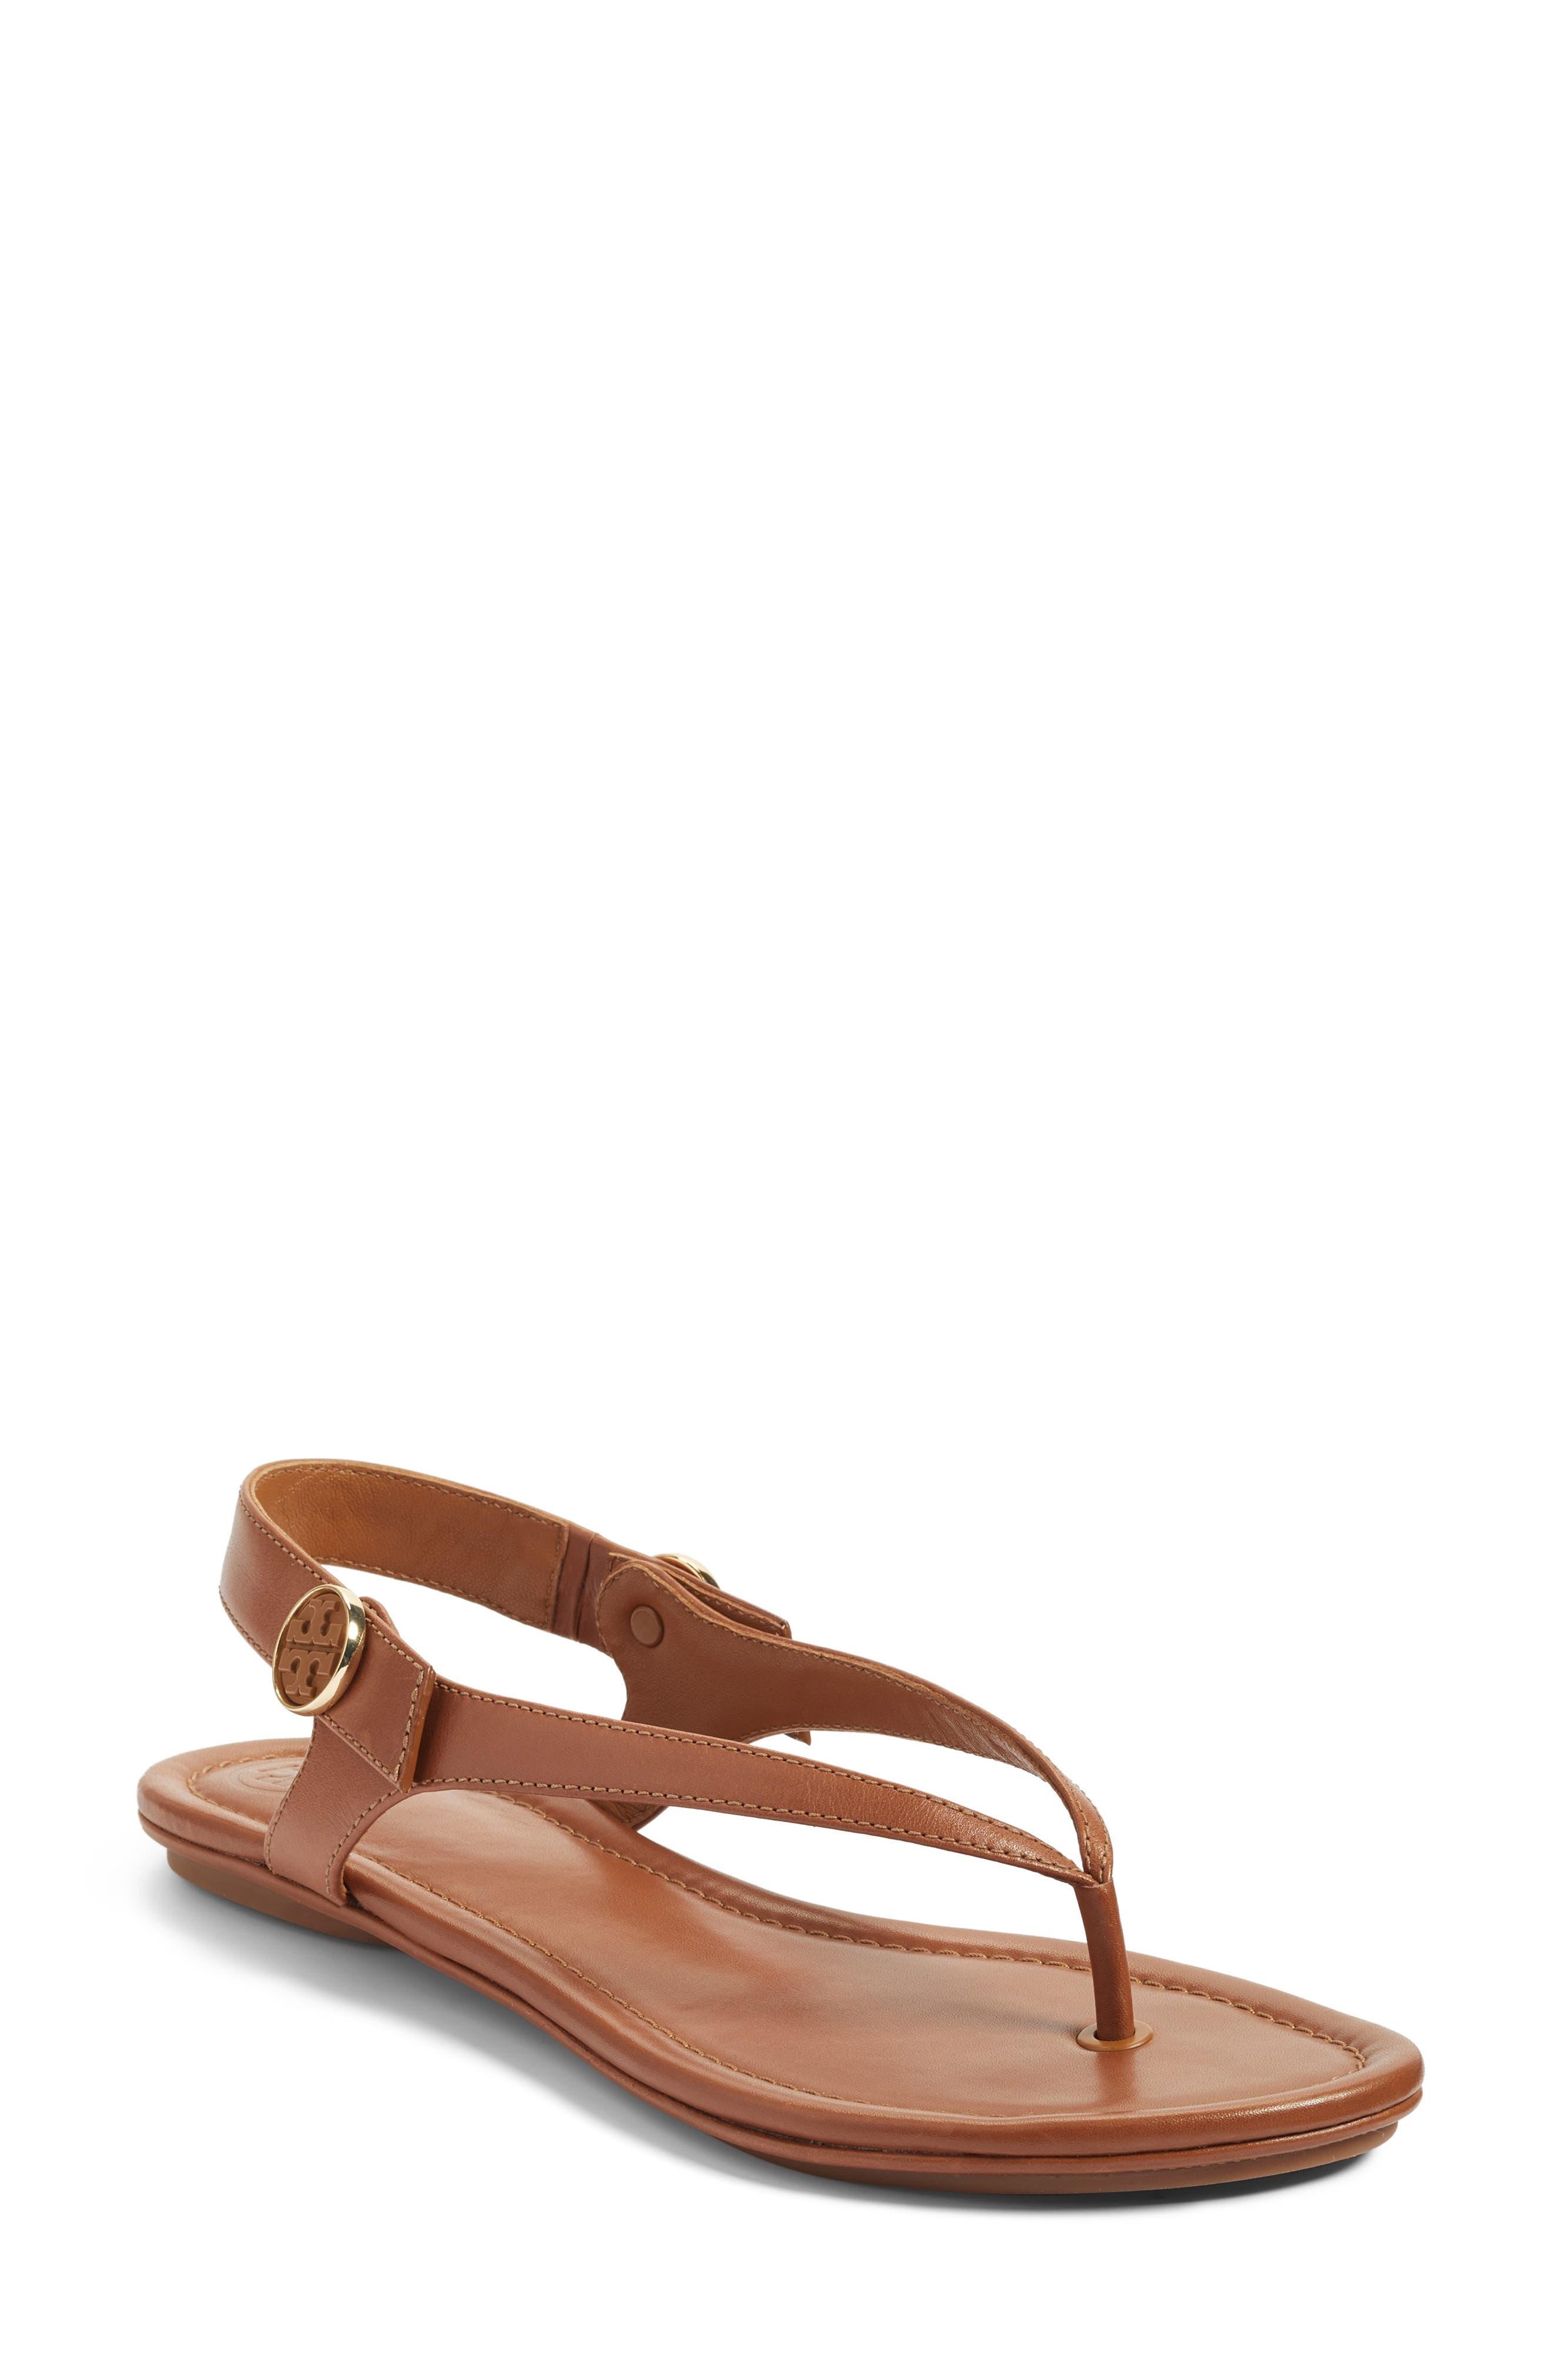 Main Image - Tory Burch Minnie Travel Thong Sandal (Women)